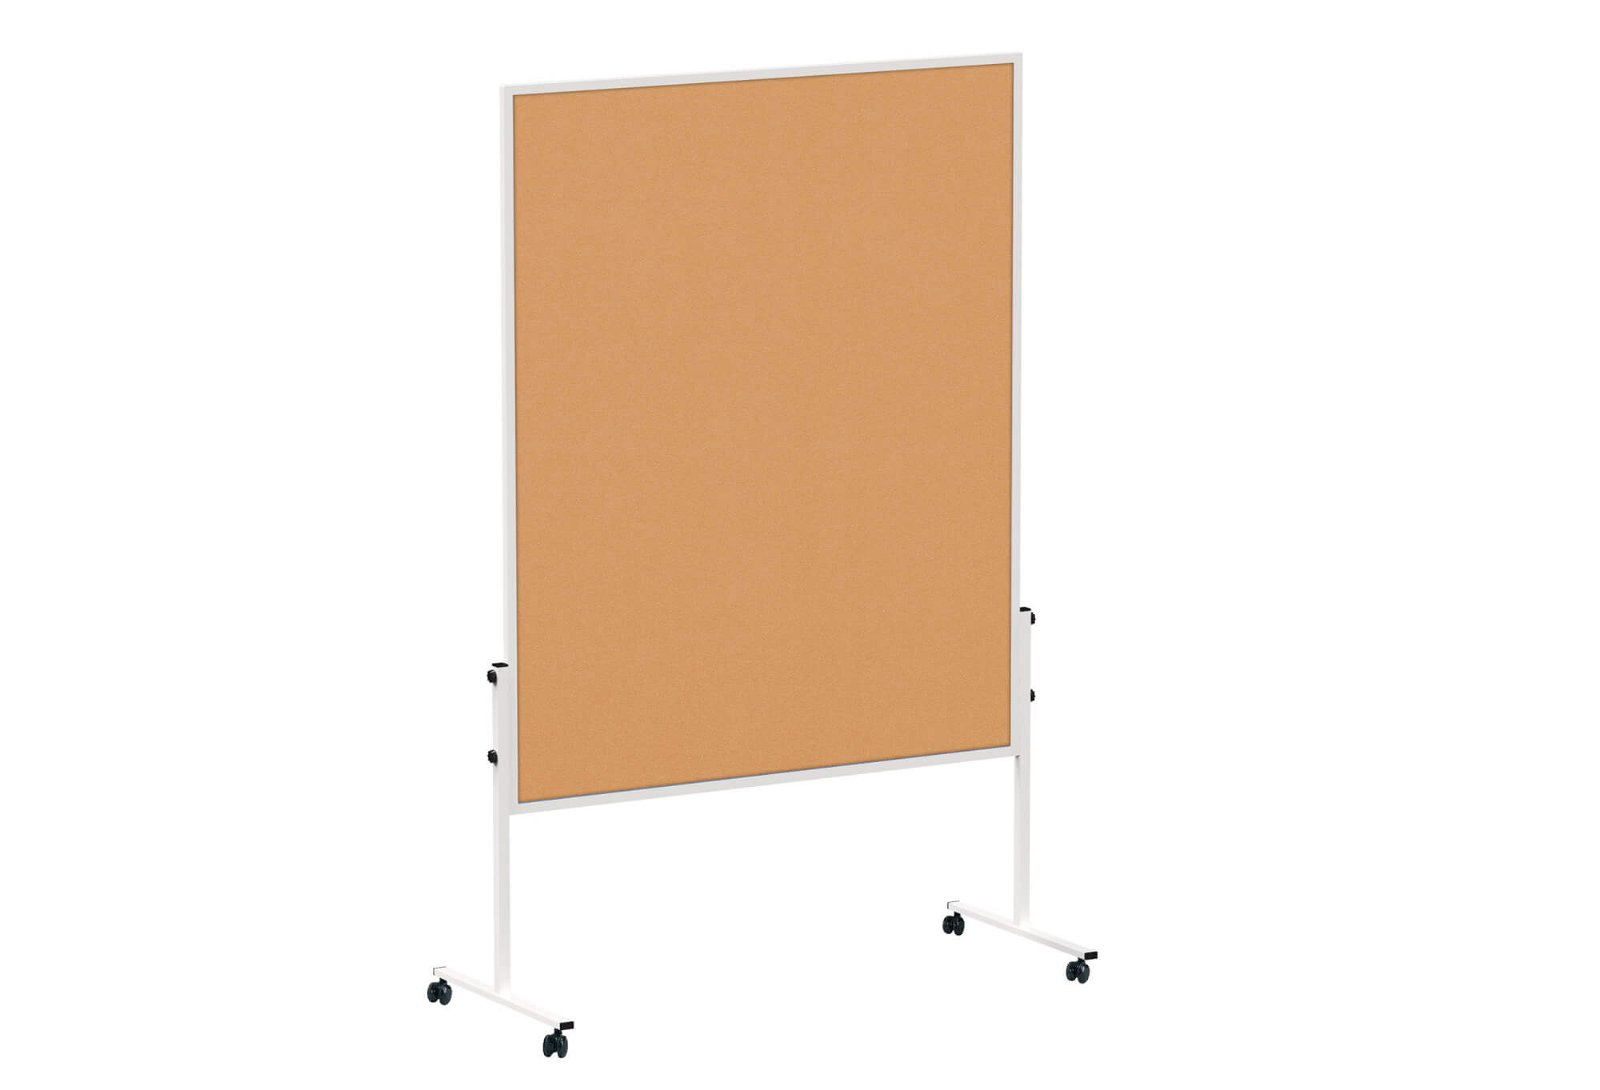 Moderationstafel MAULsolid Kork, 150x120 cm, grau